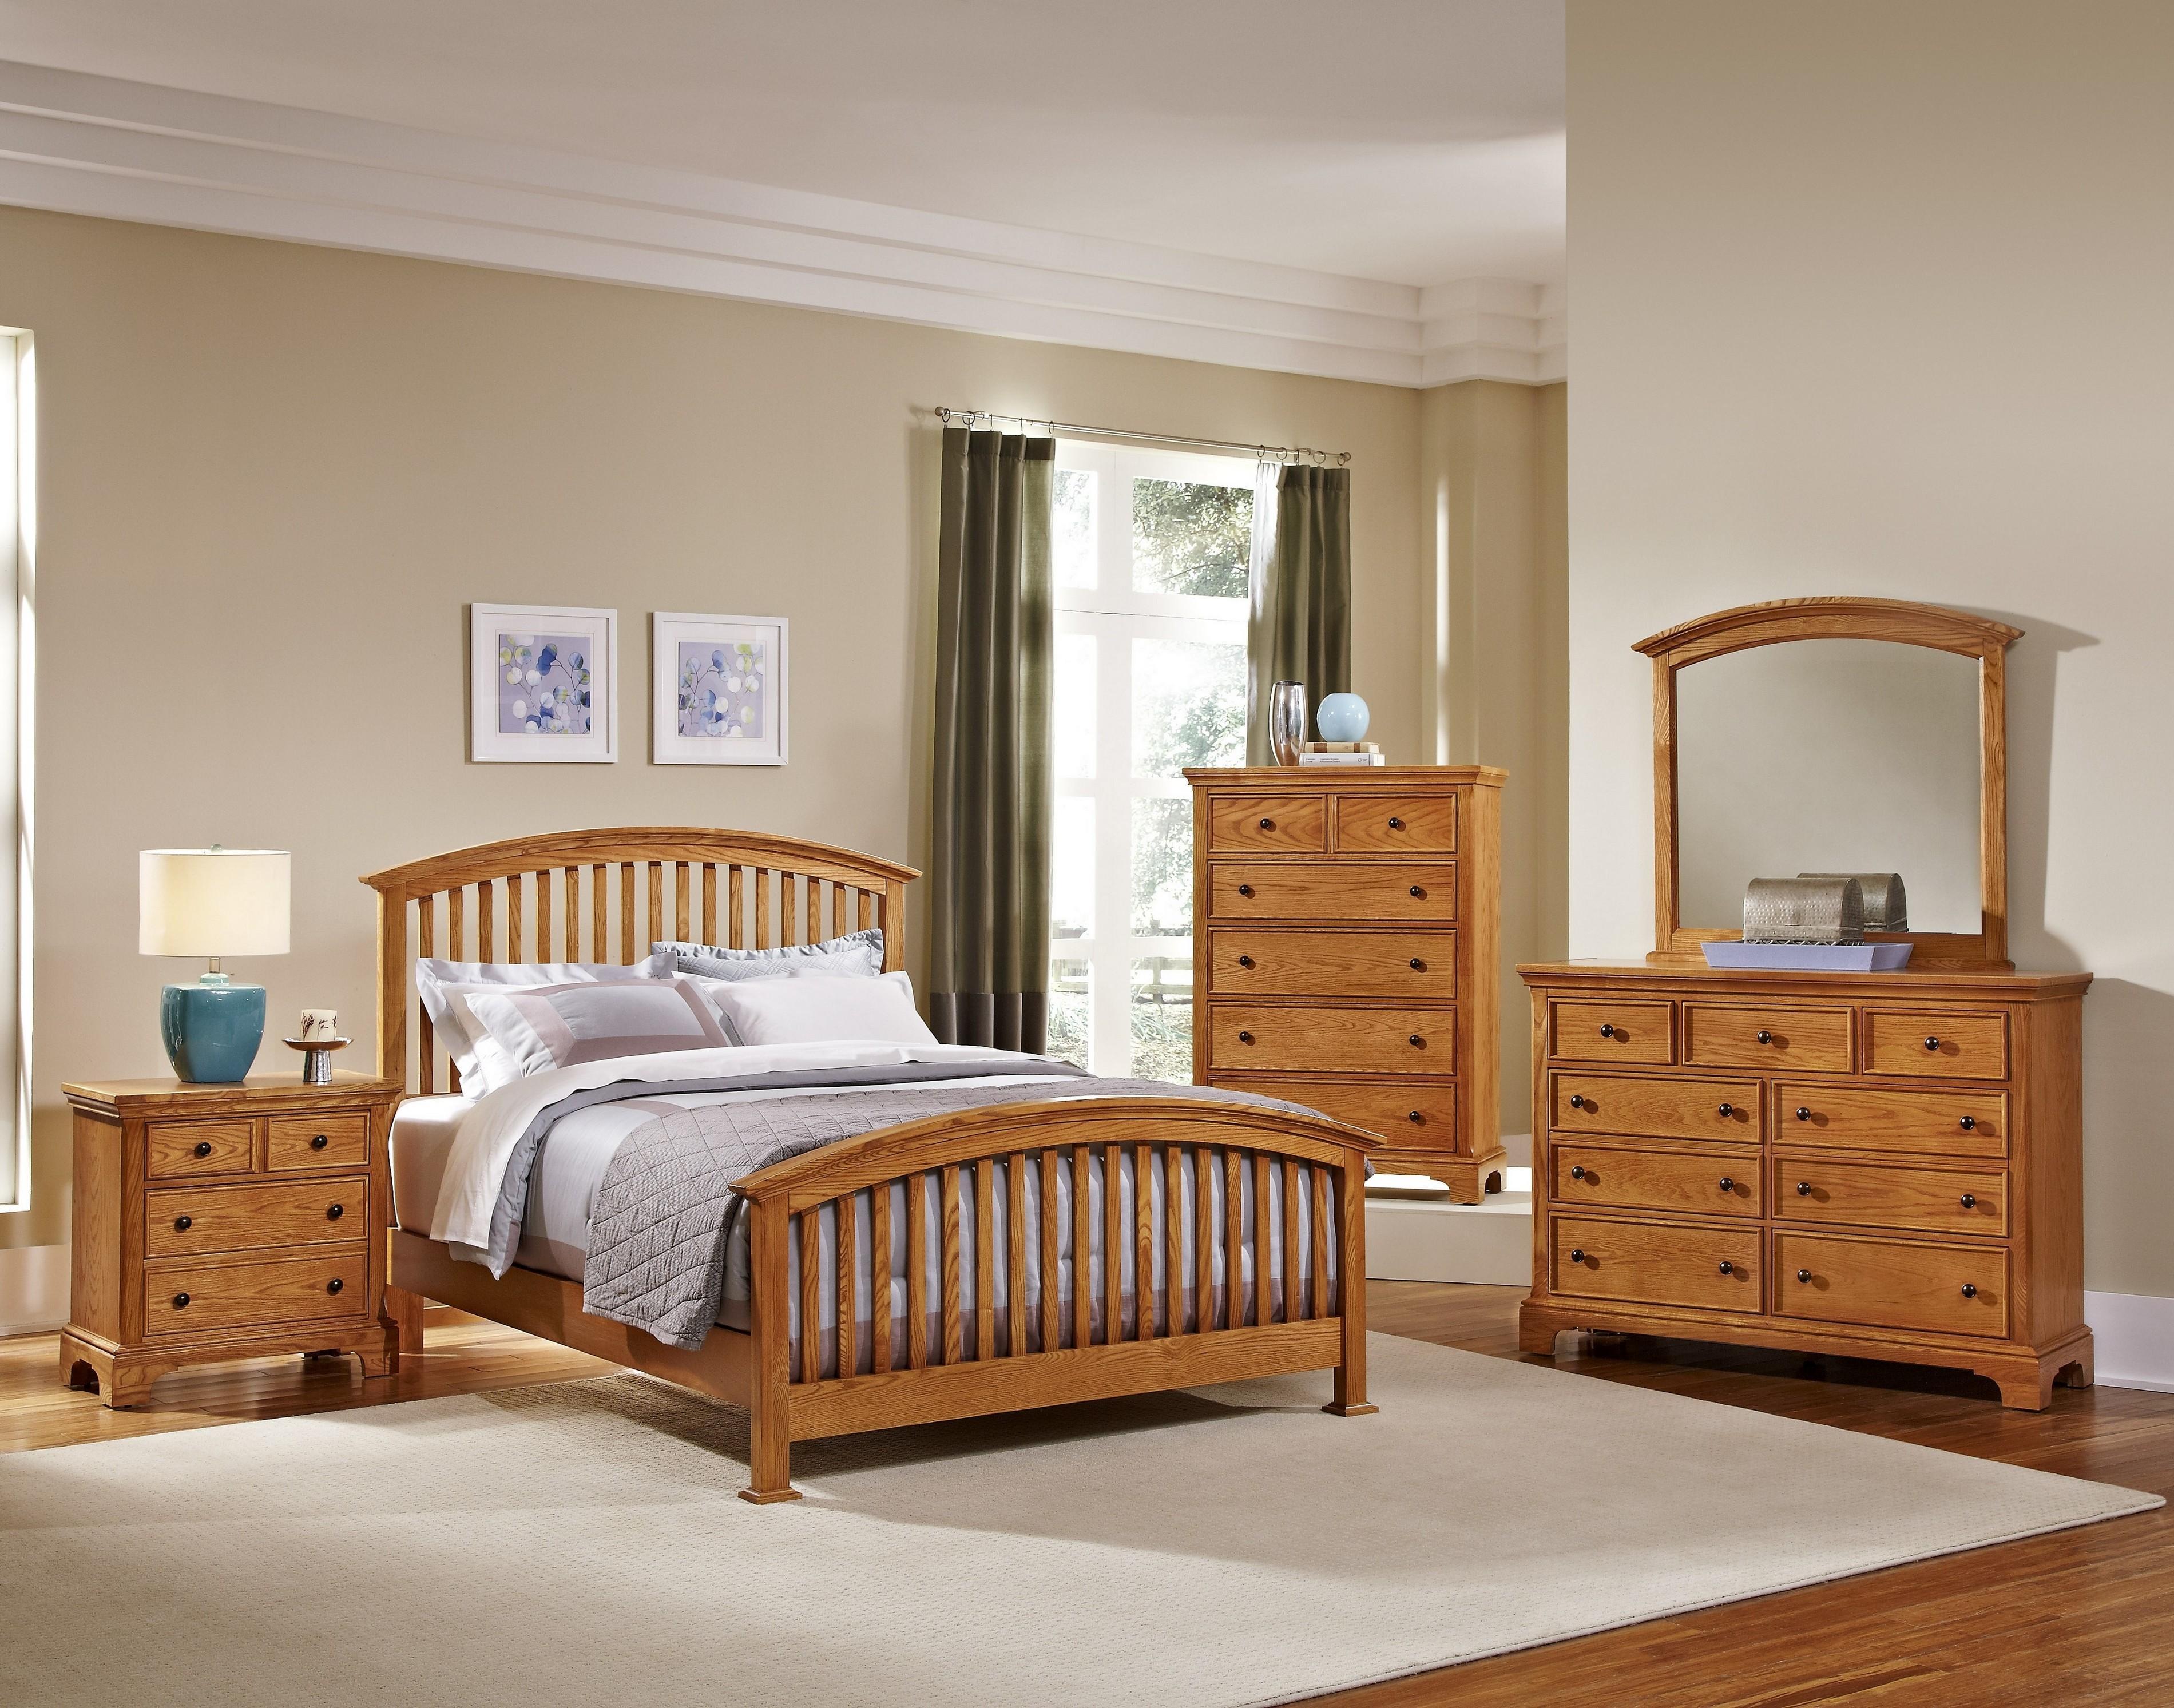 Vaughan Bassett Forsyth Queen Bedroom Group - Item Number: BB75 Q Bedroom Group 3